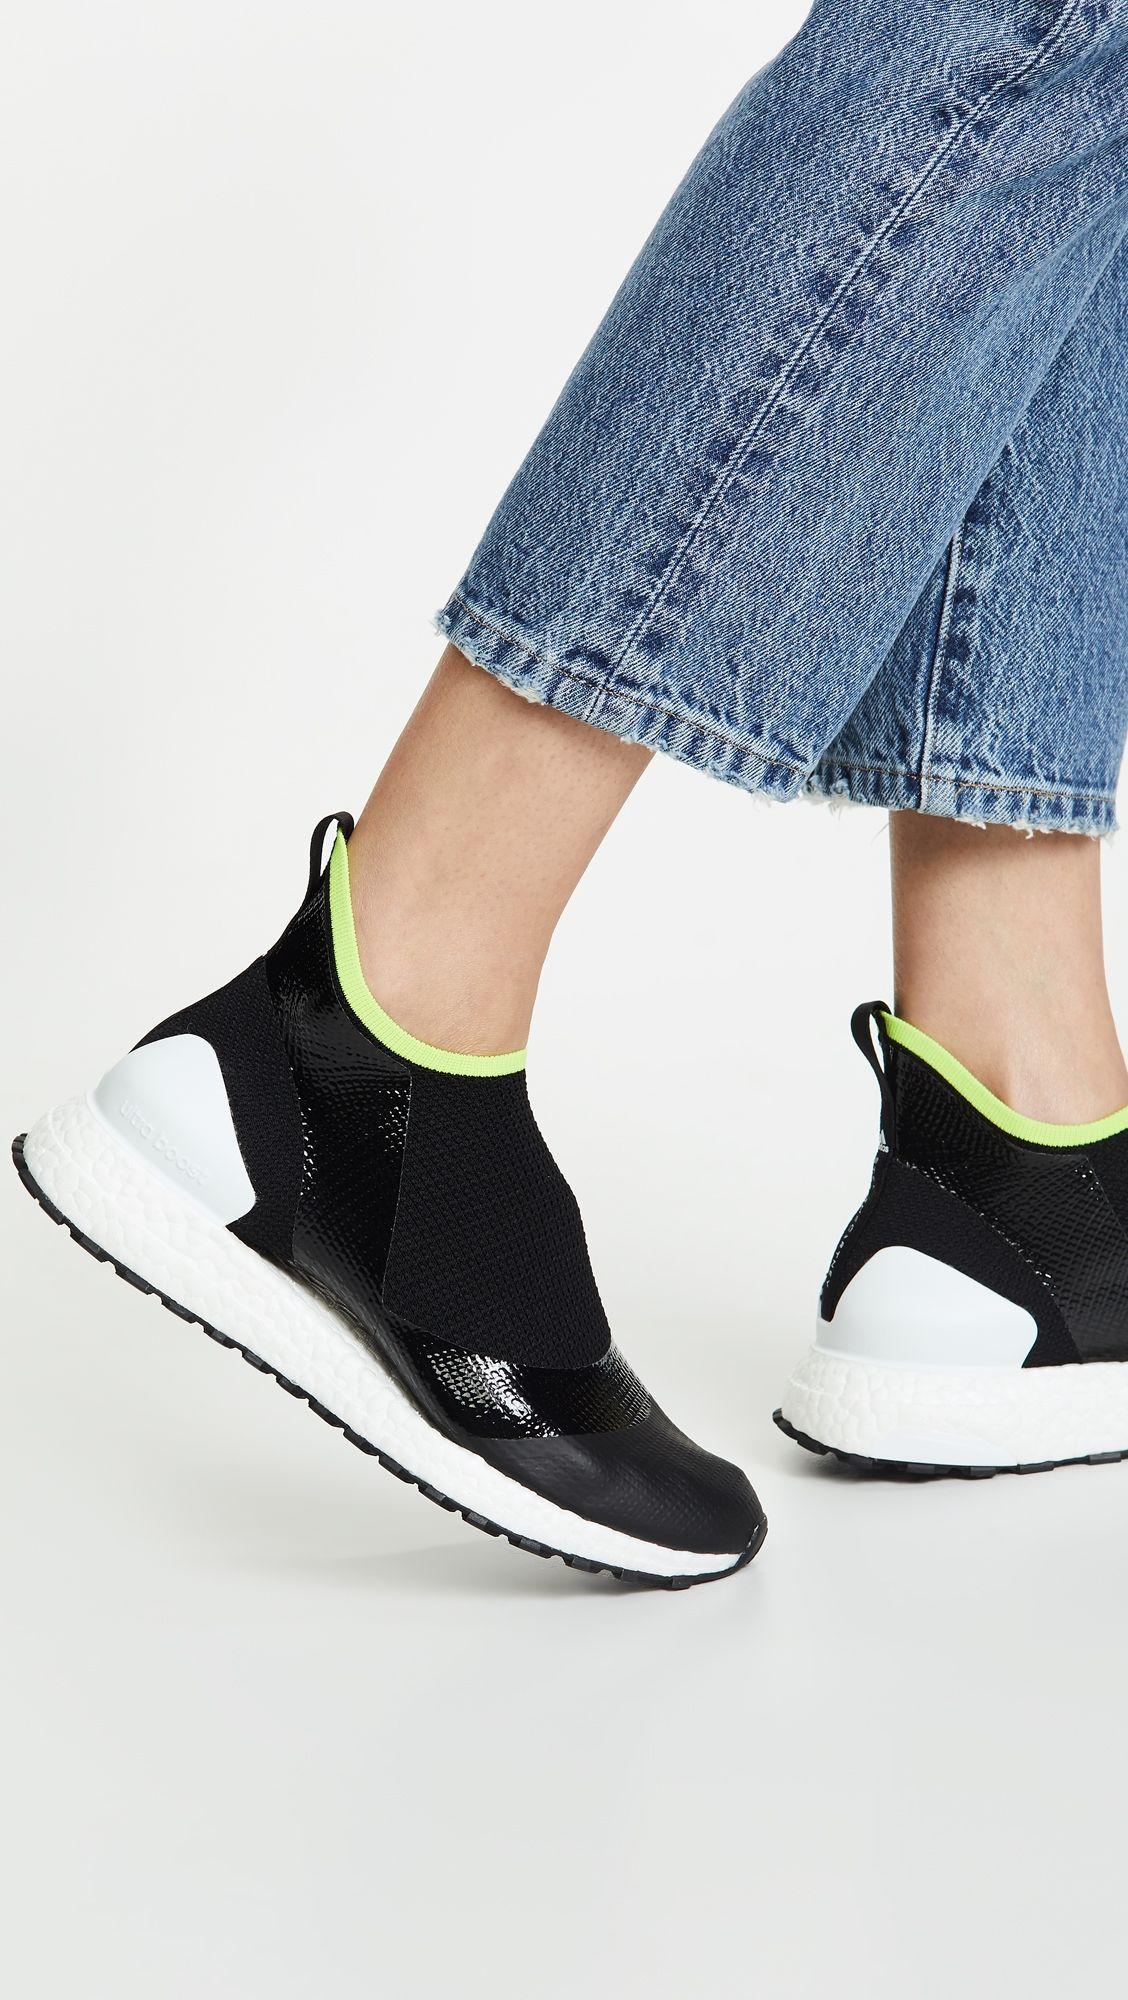 ADIDAS by STELLA McCARTNEY Ultraboost X Atr Sneakers Mujer